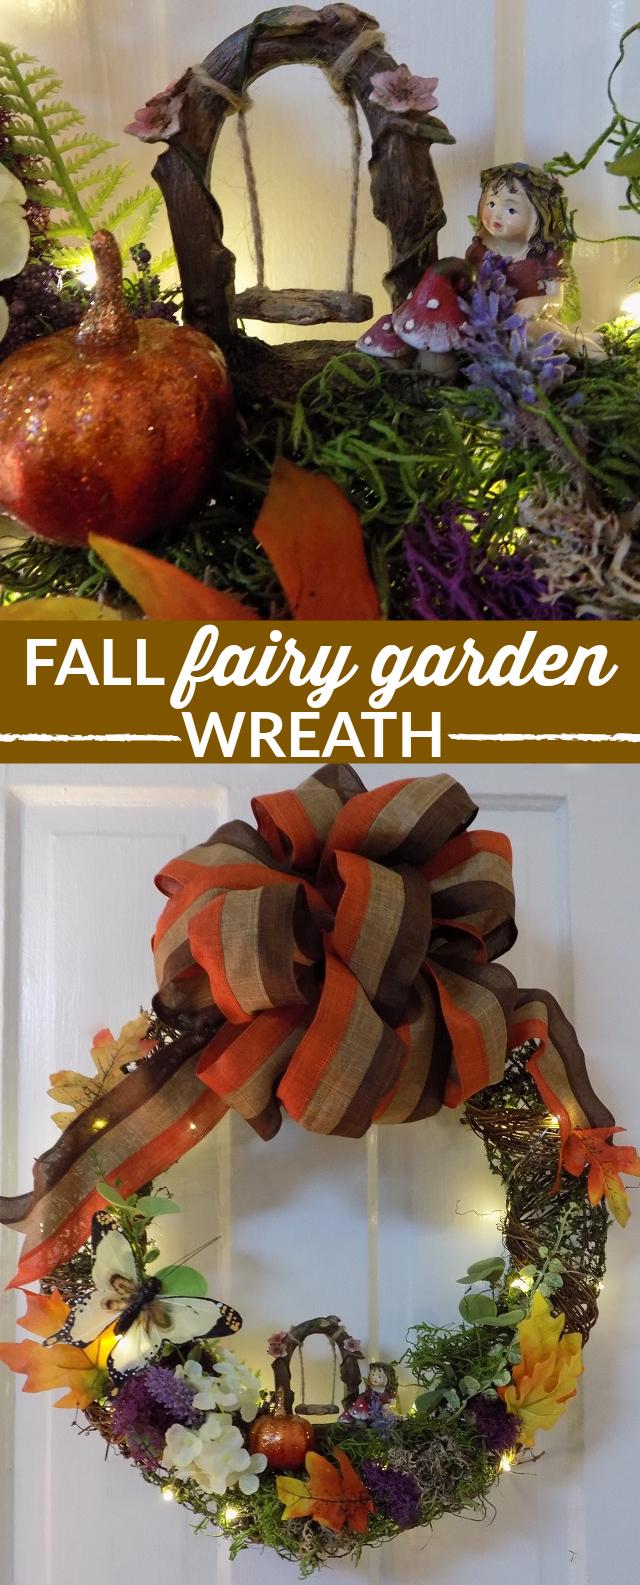 One Savvy Mom ™   NYC Area Mom Blog: Fall Fairy Garden Wreath How-To